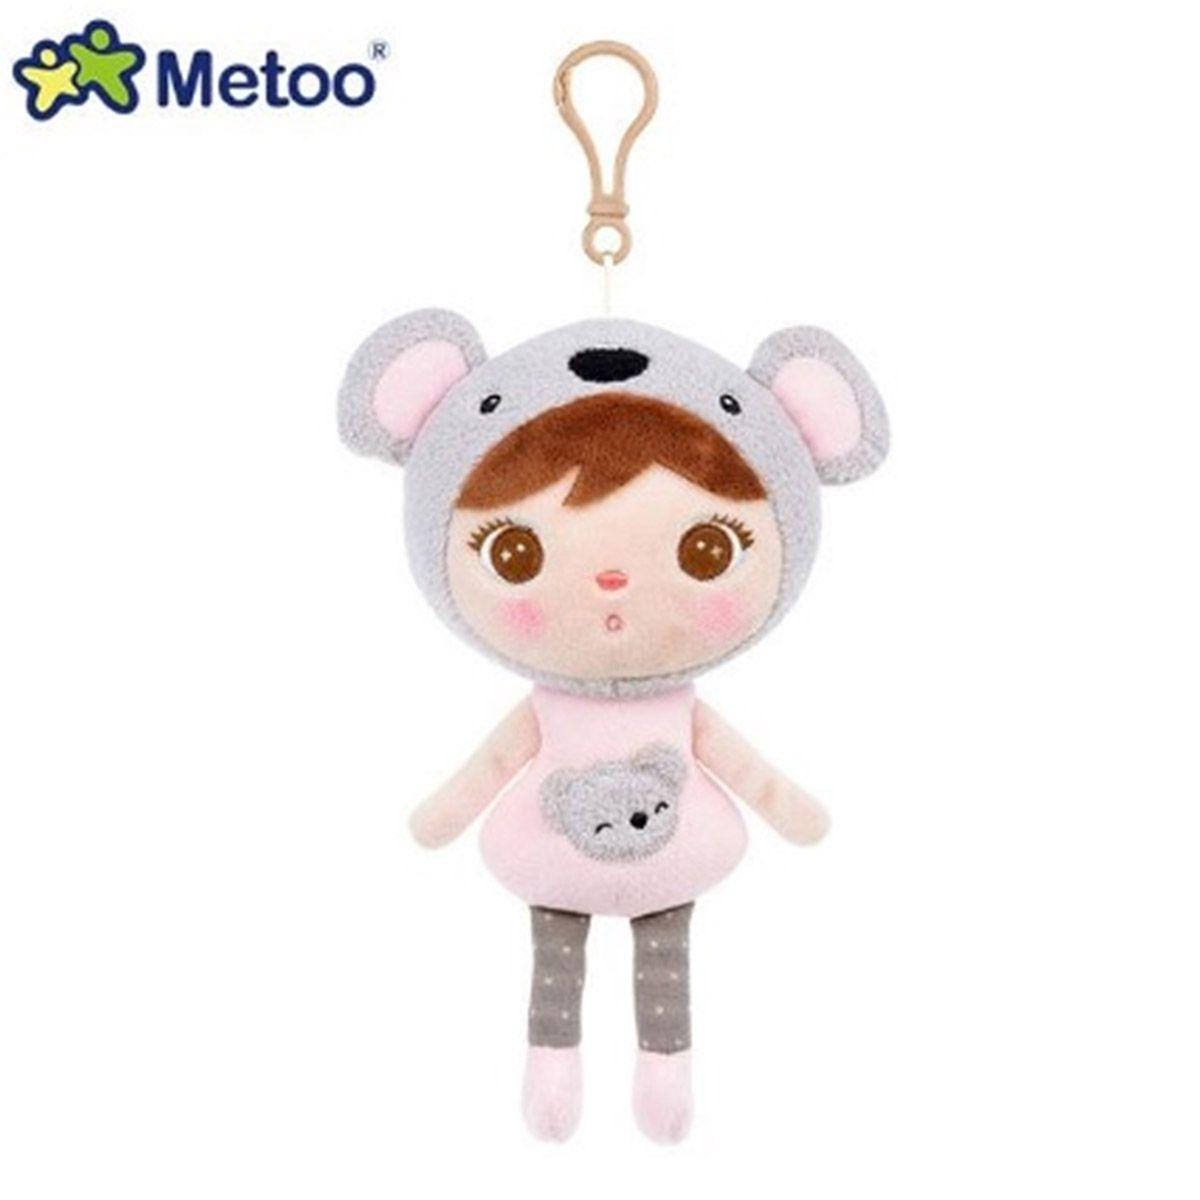 Mini Doll Jimbao Koala 21cm - Metoo